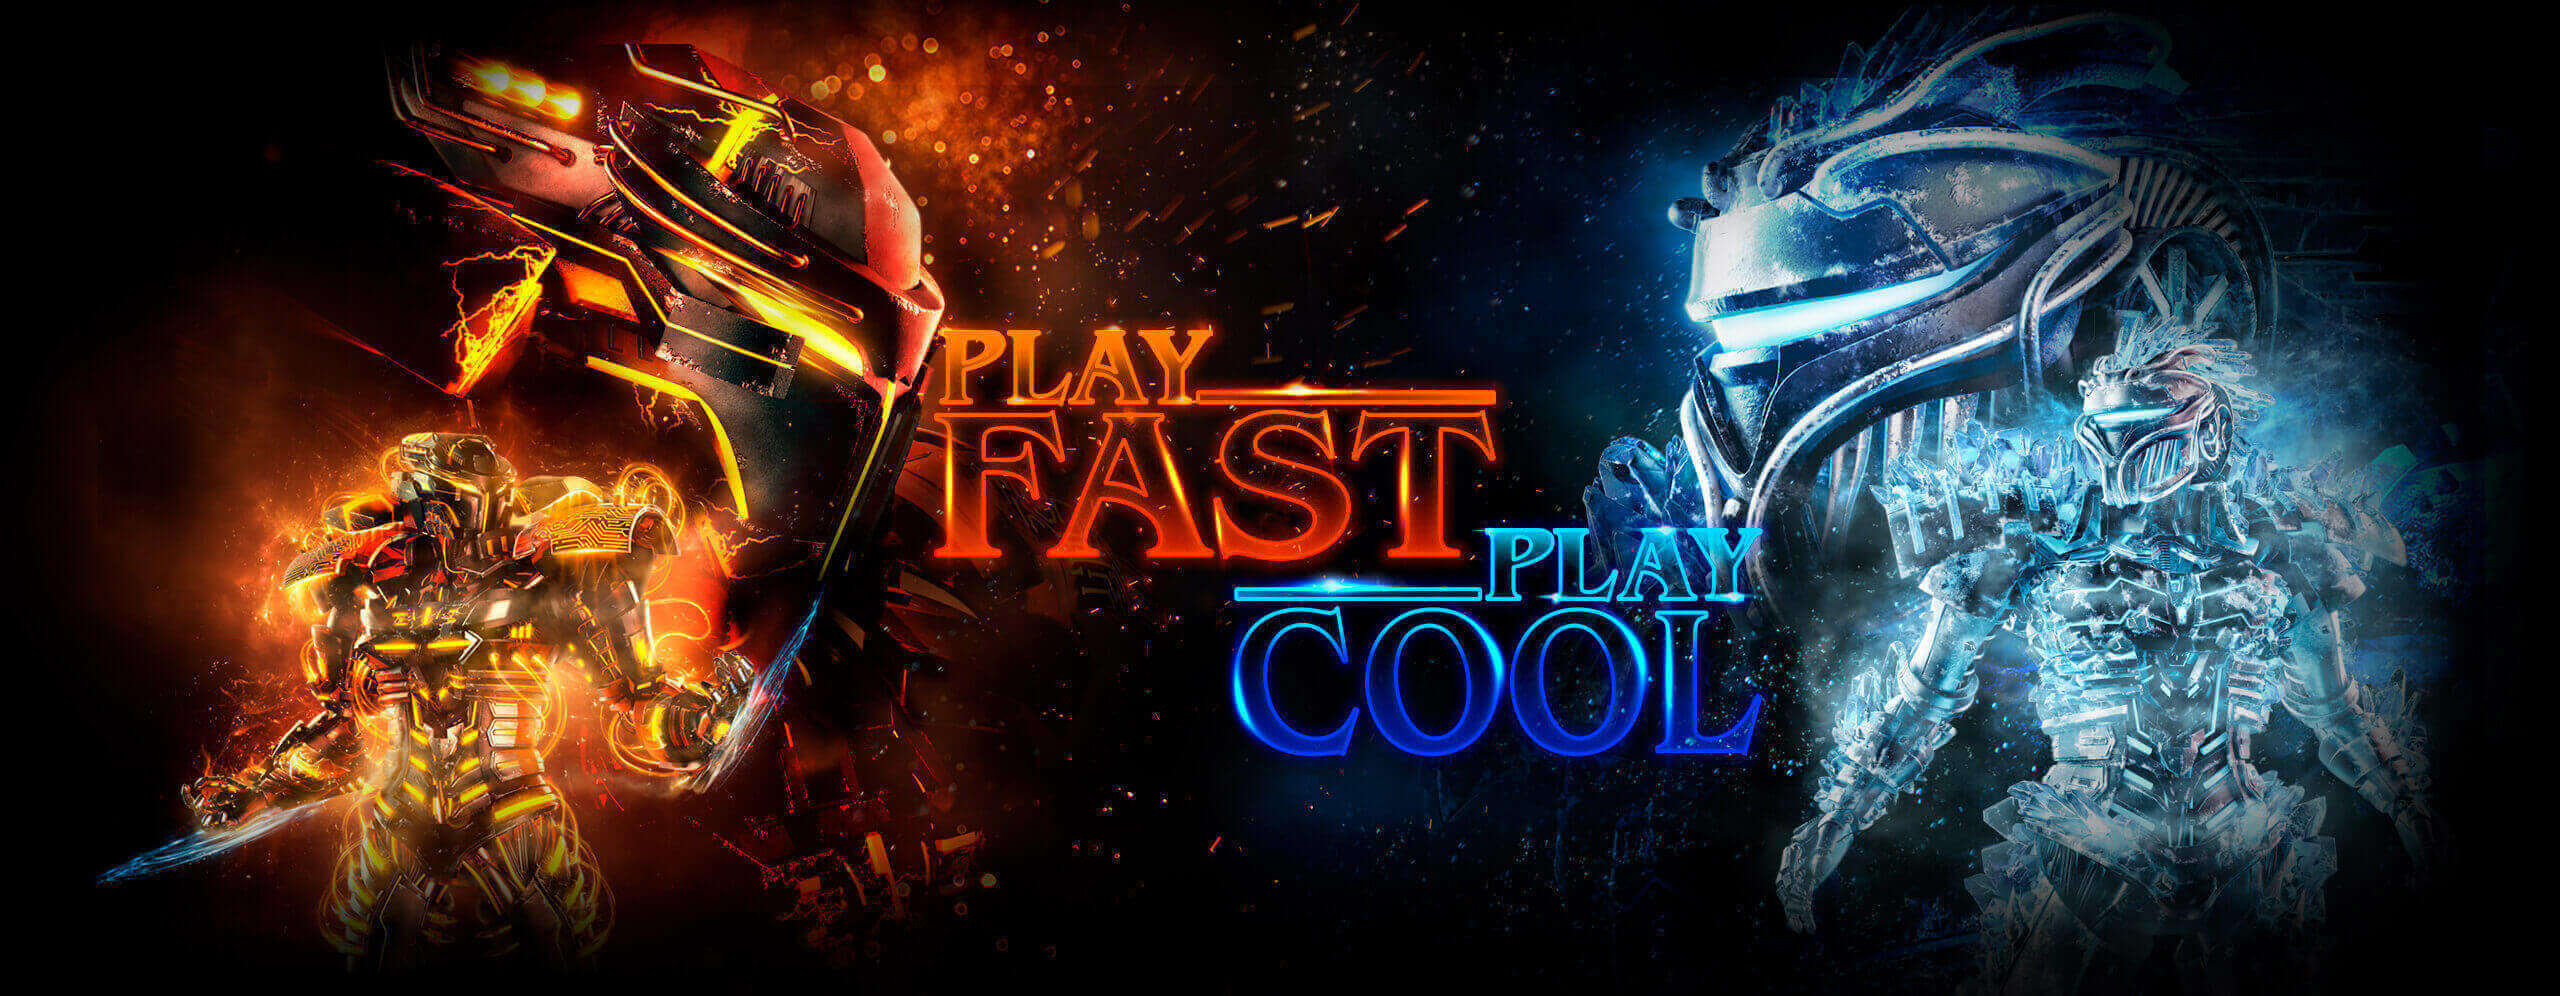 PlayFastPlayCool-PC-KV